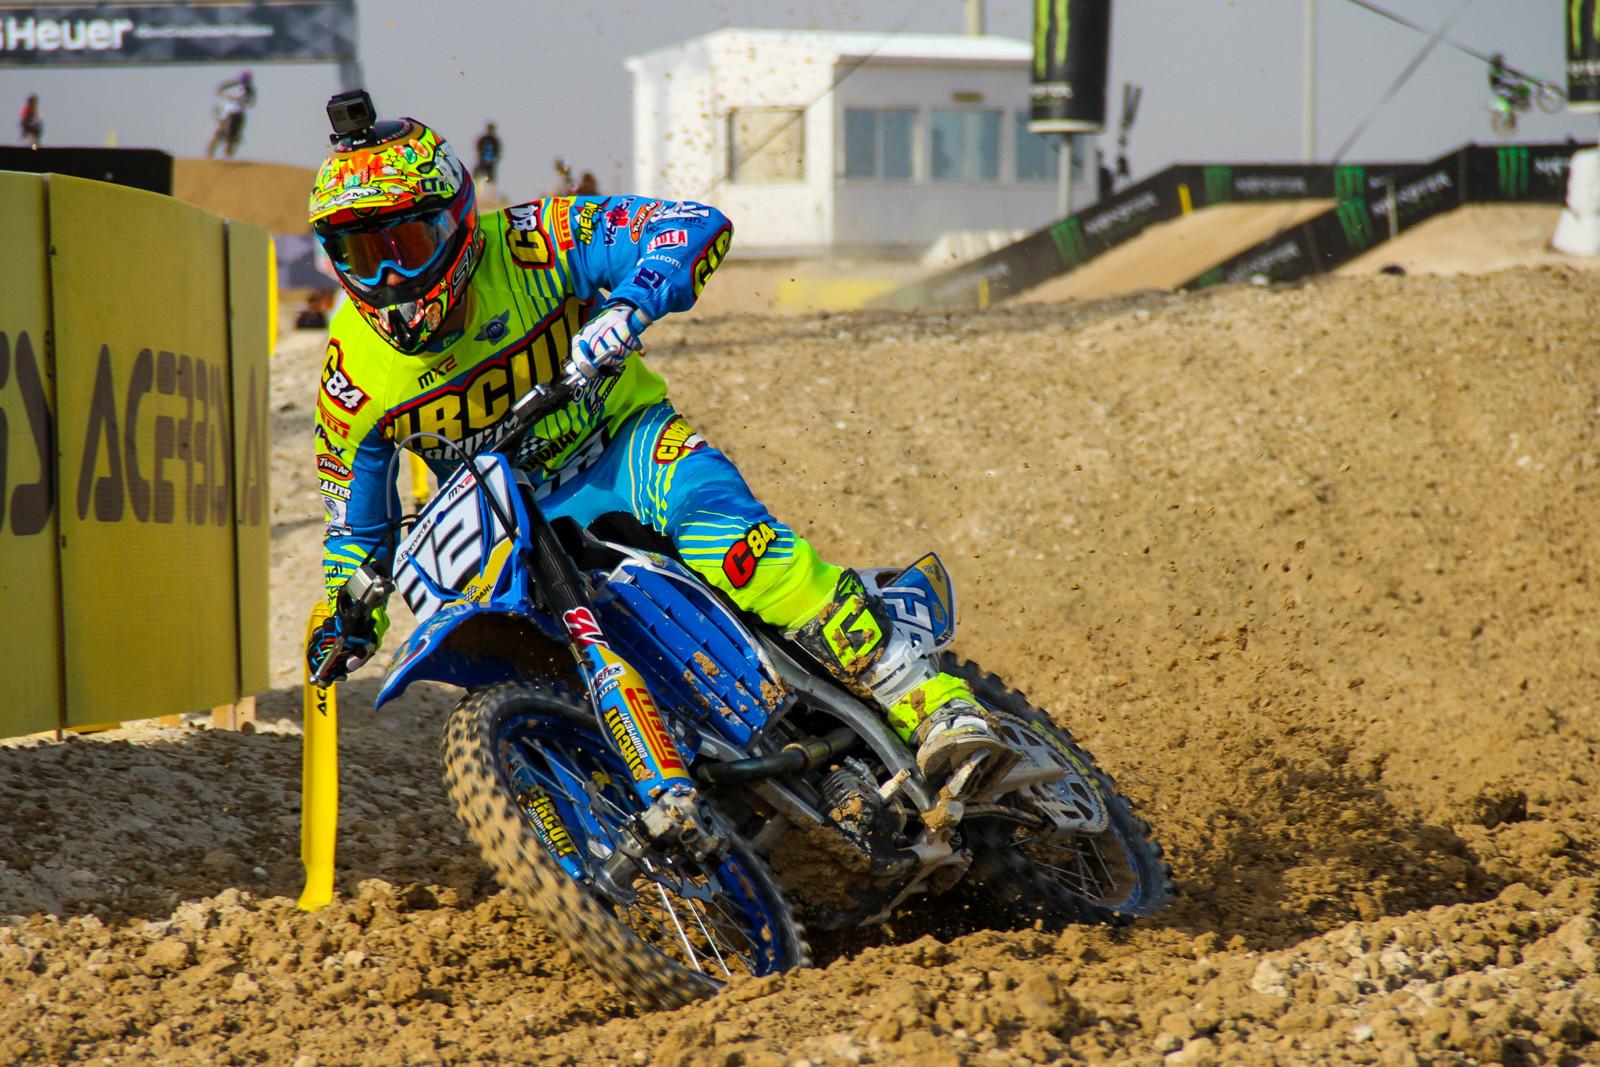 Samuele Bernardini  - Photo Blast: 2017 MXGP of Qatar - Motocross Pictures - Vital MX